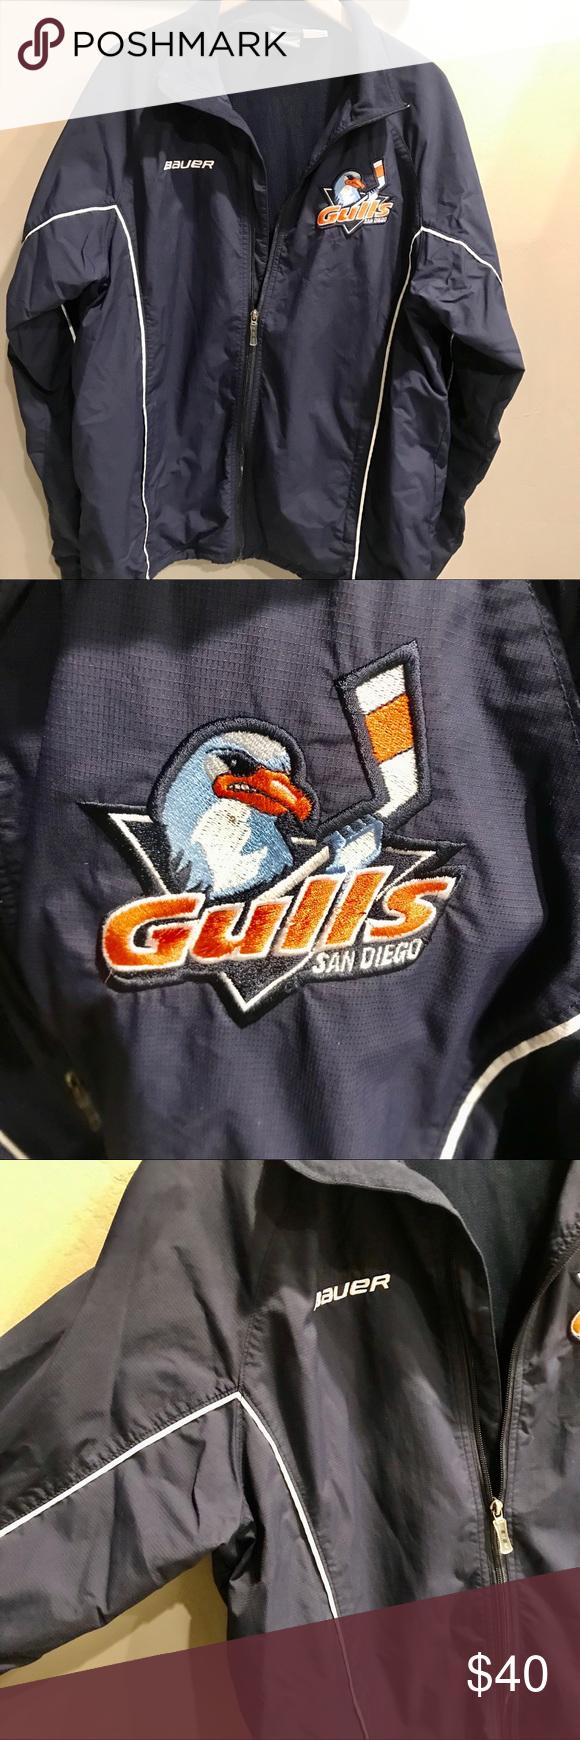 San Diego Gulls Hockey Jacket In 2020 Jackets Fashion Athletic Jacket